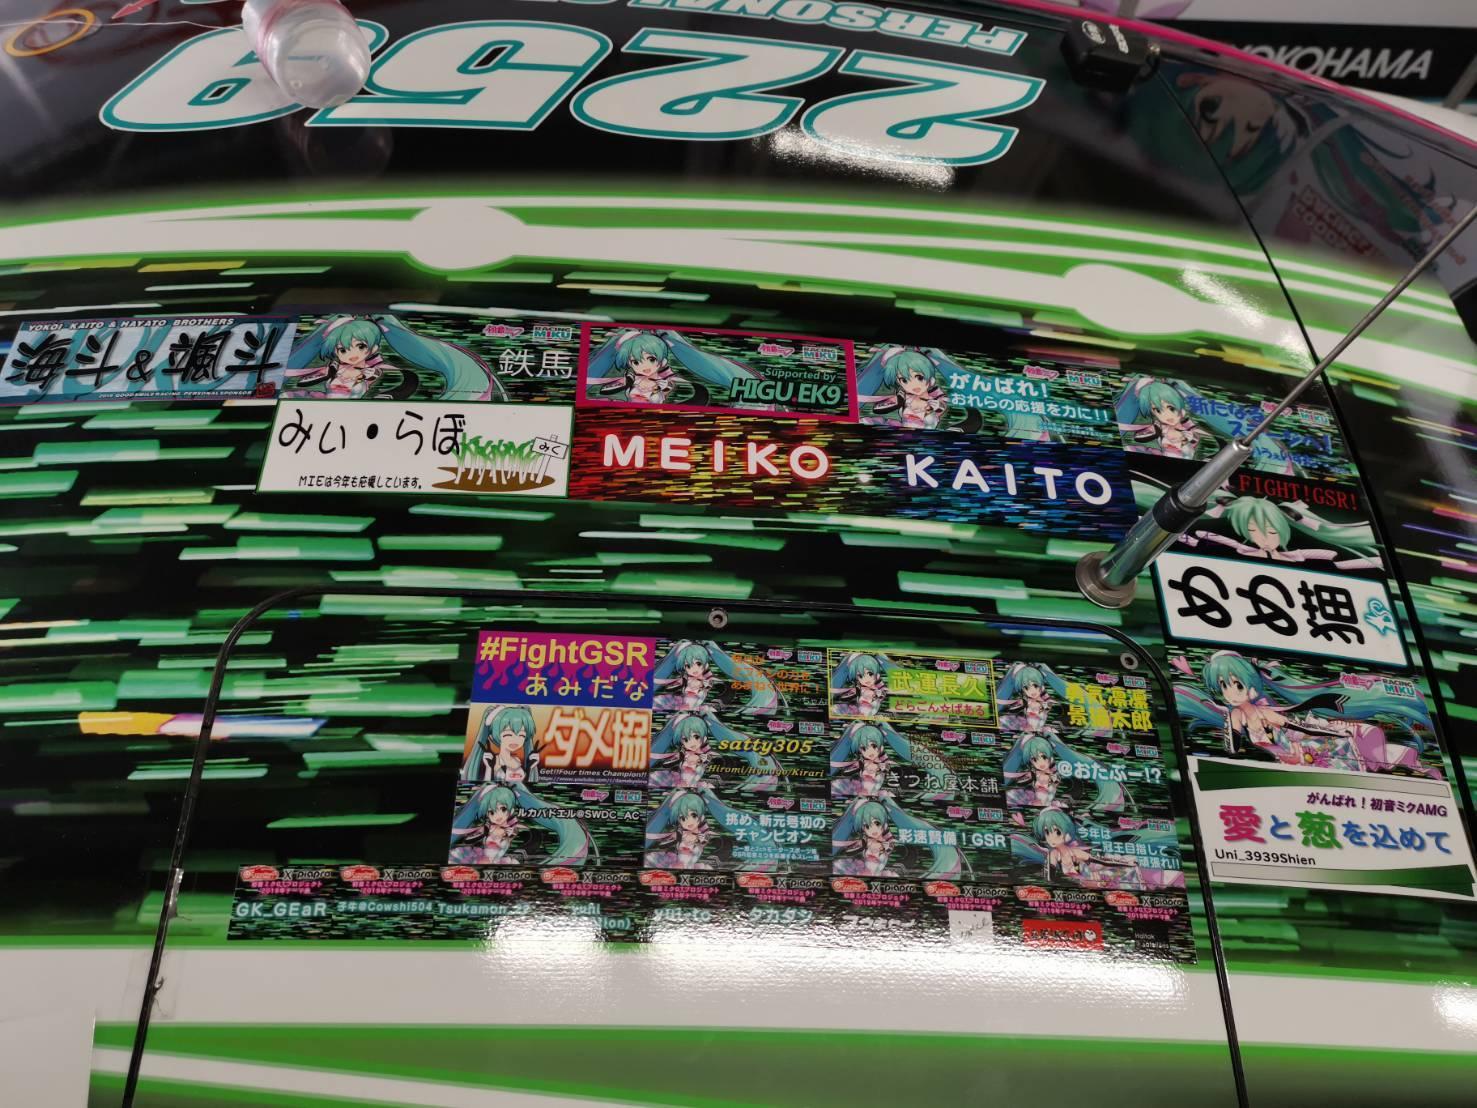 【SUPER GT Round3 鈴鹿】レーススケジュール_e0379343_16370569.jpg